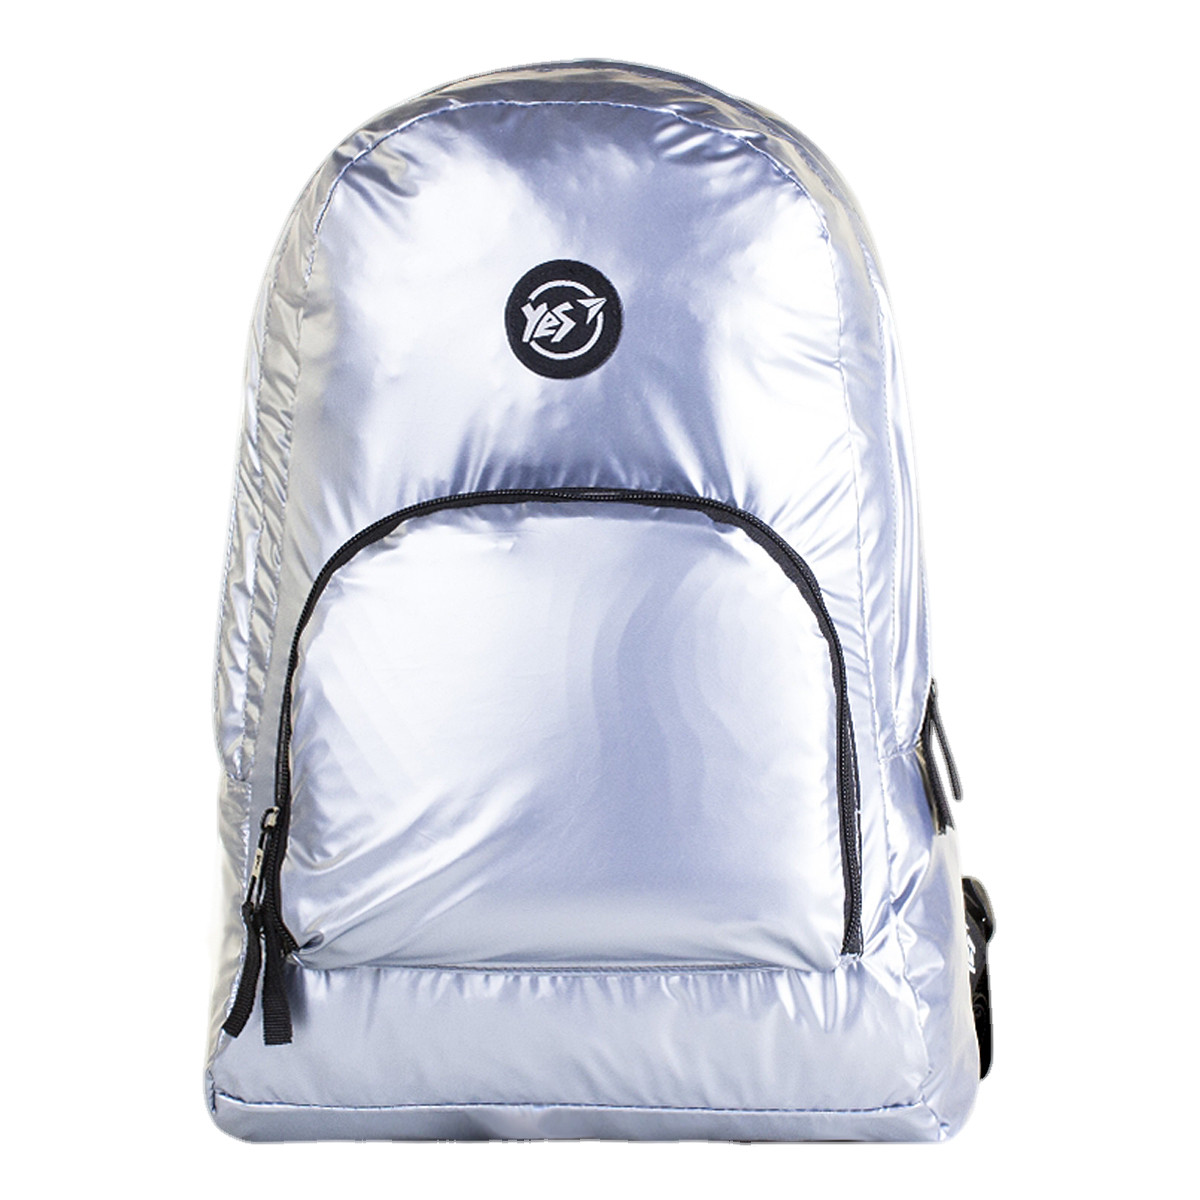 Рюкзак молодежный YES DY-15 Ultra light Серый металлик (558437)